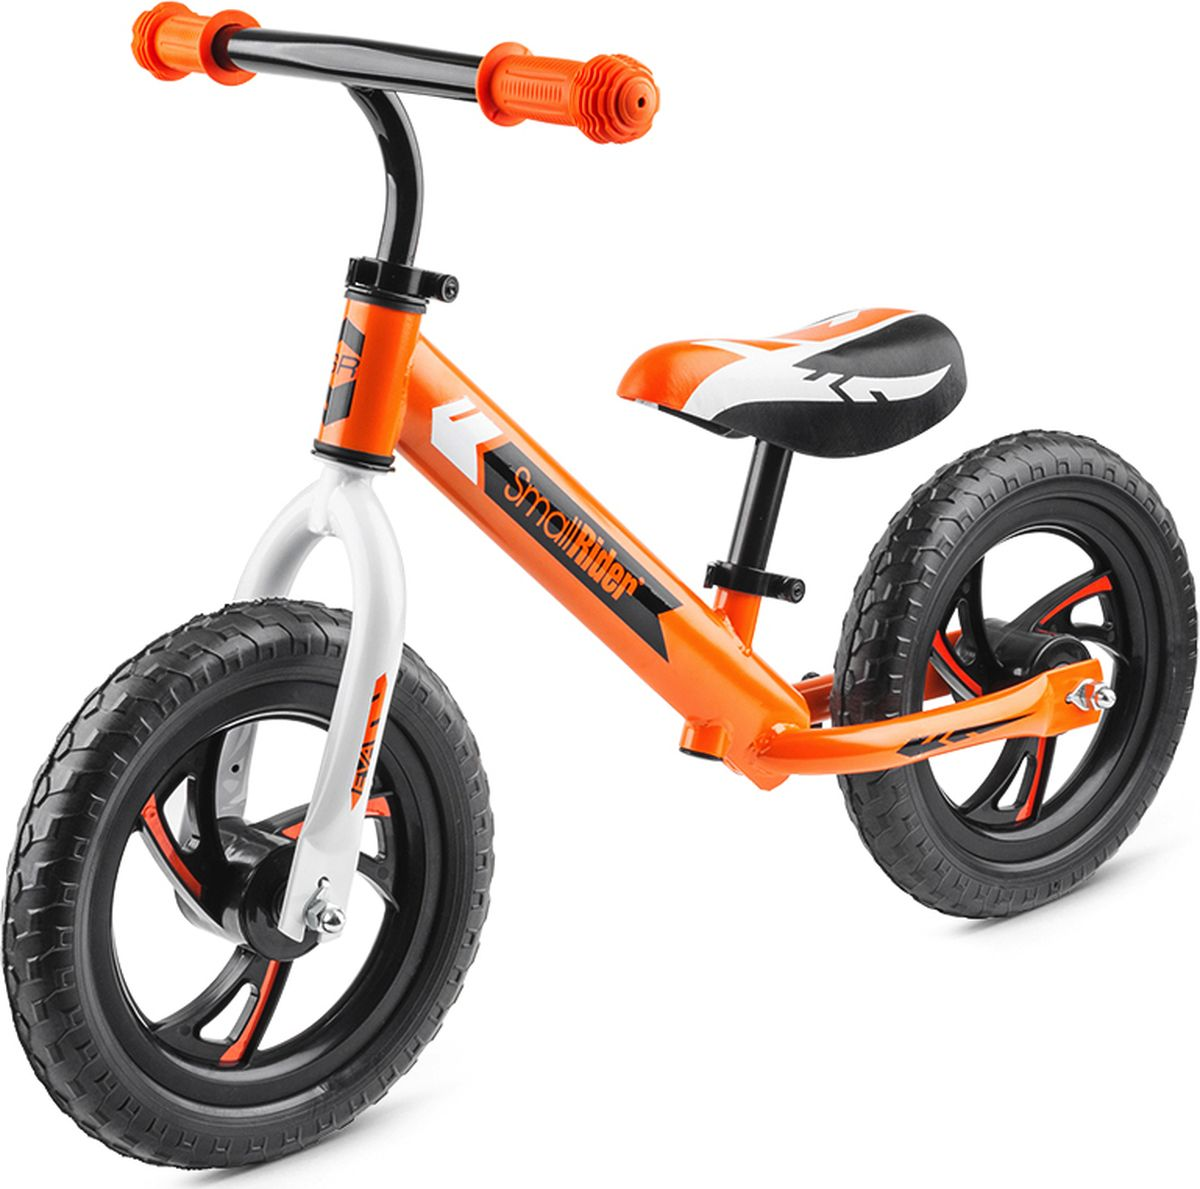 Small Rider Беговел детский Roadster цвет оранжевый беговел popbike flash orange